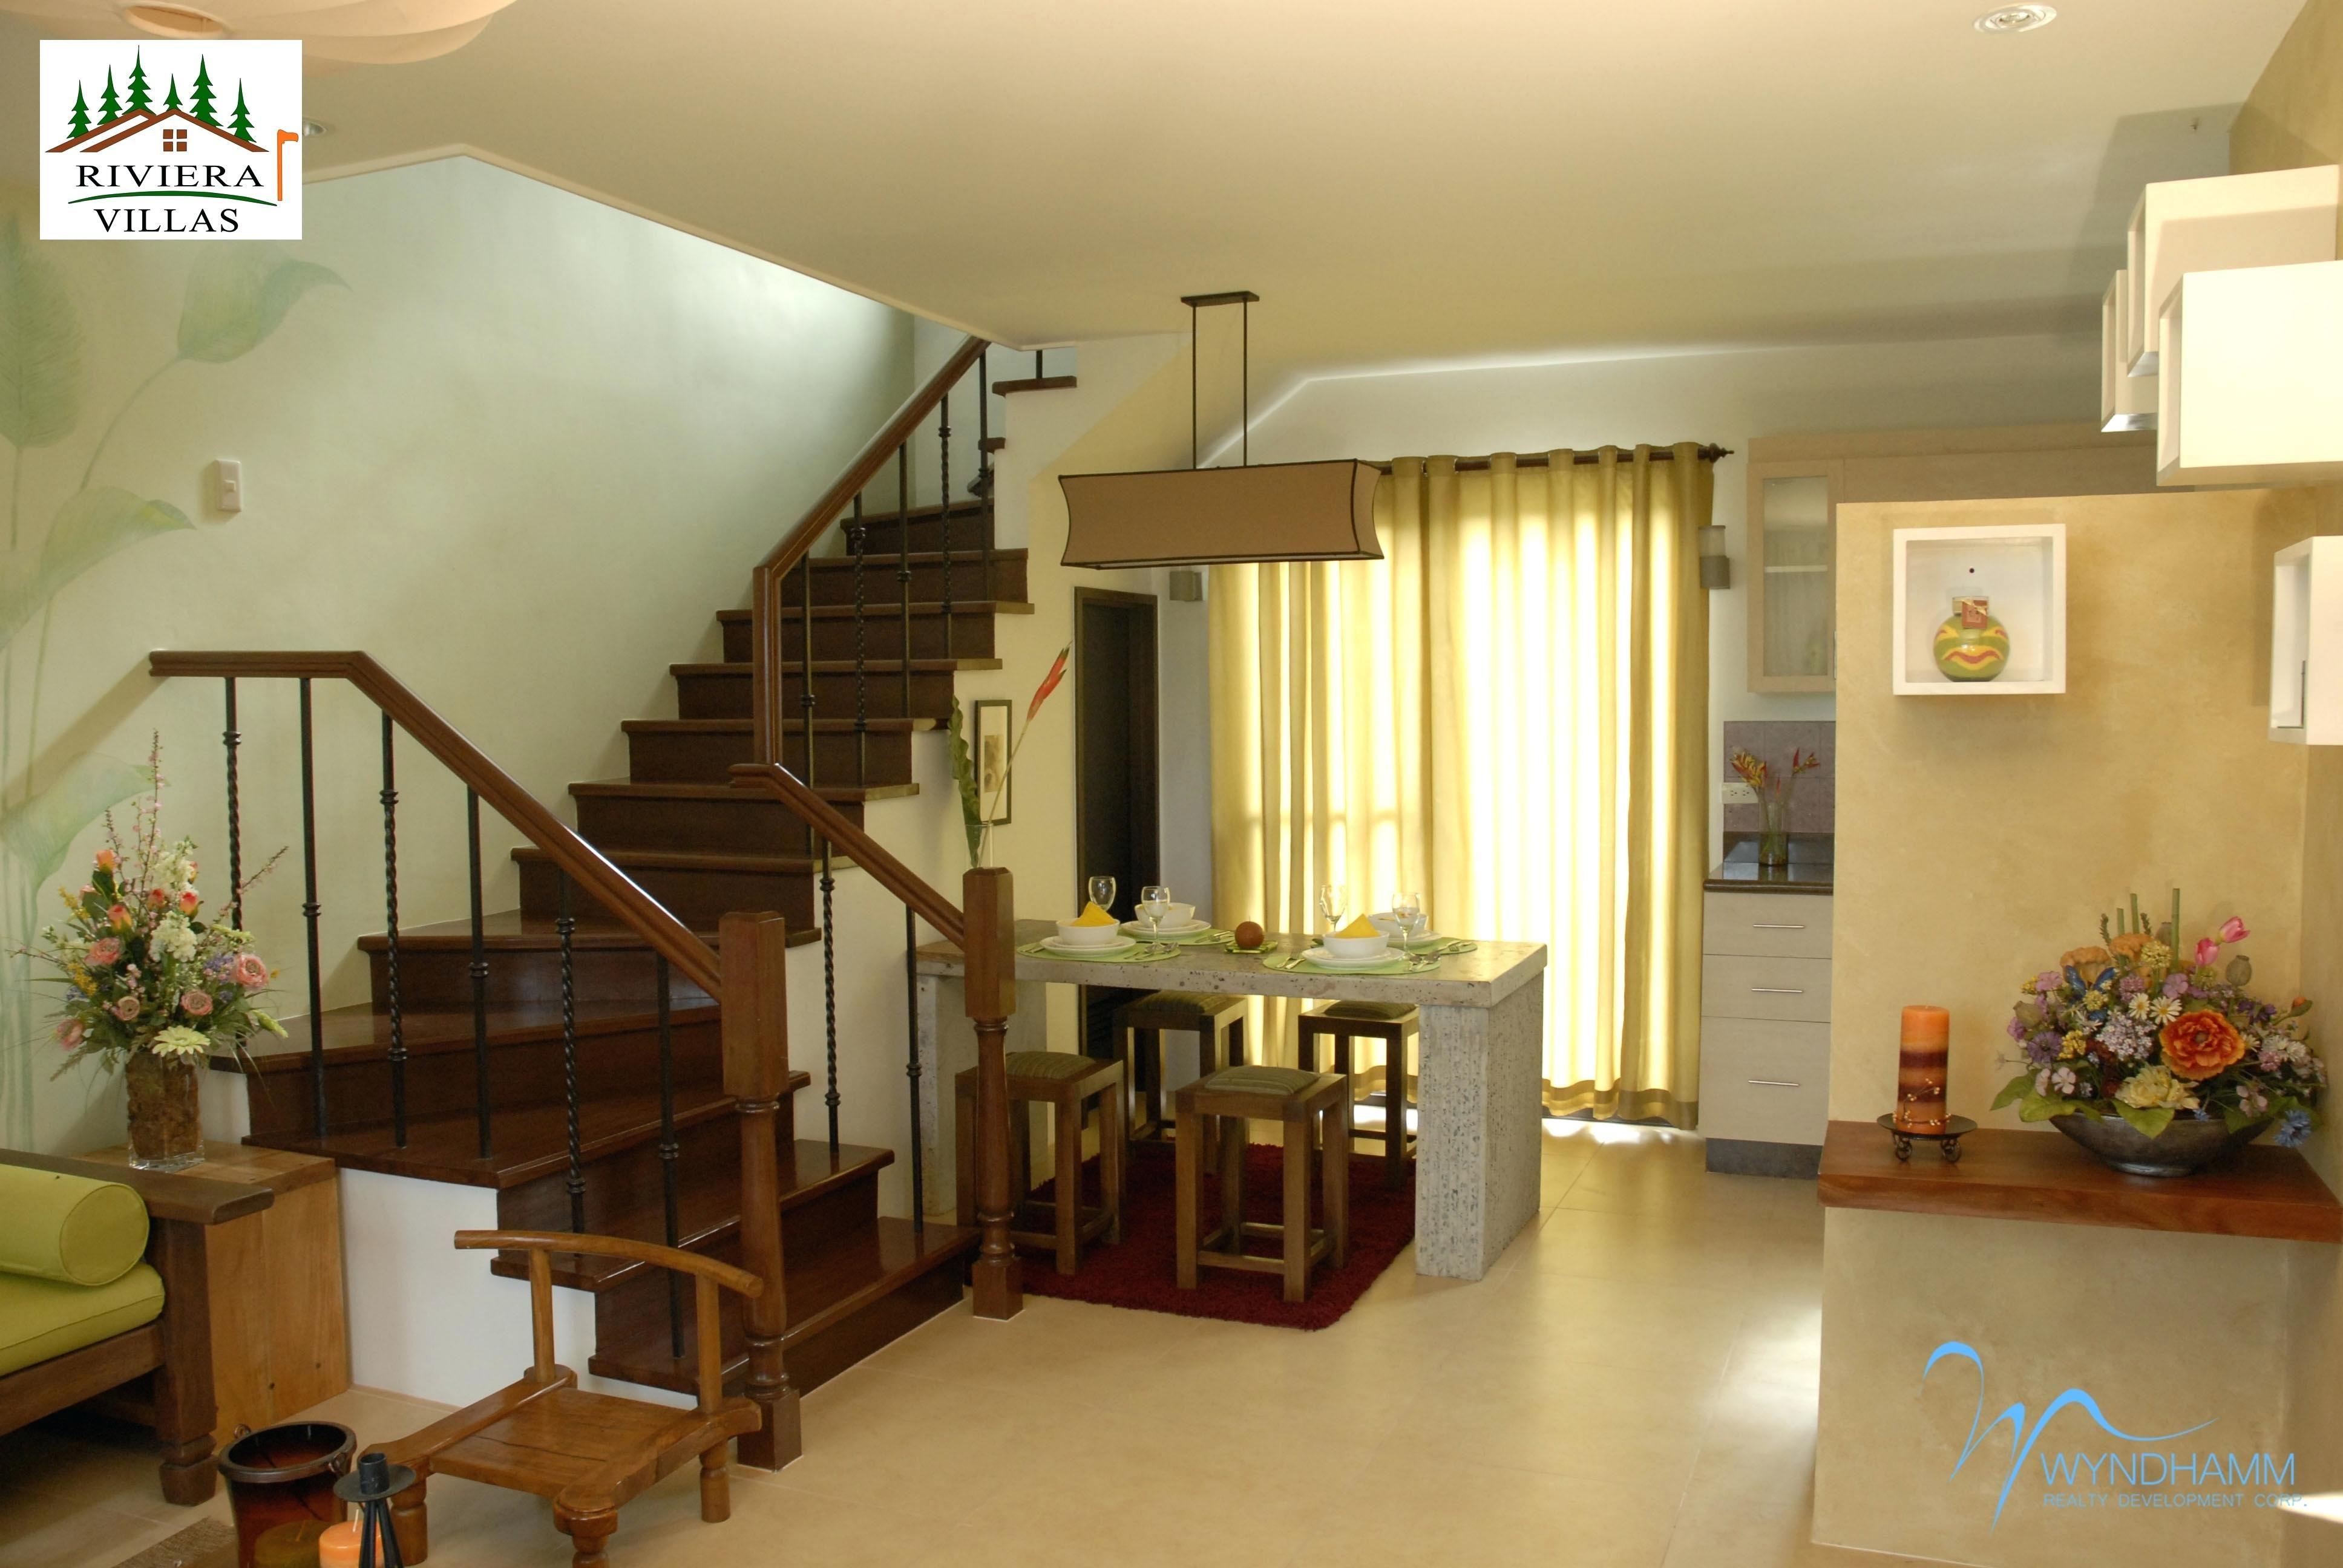 Simple 2 Storey House Interior Design In 2020 2 Storey